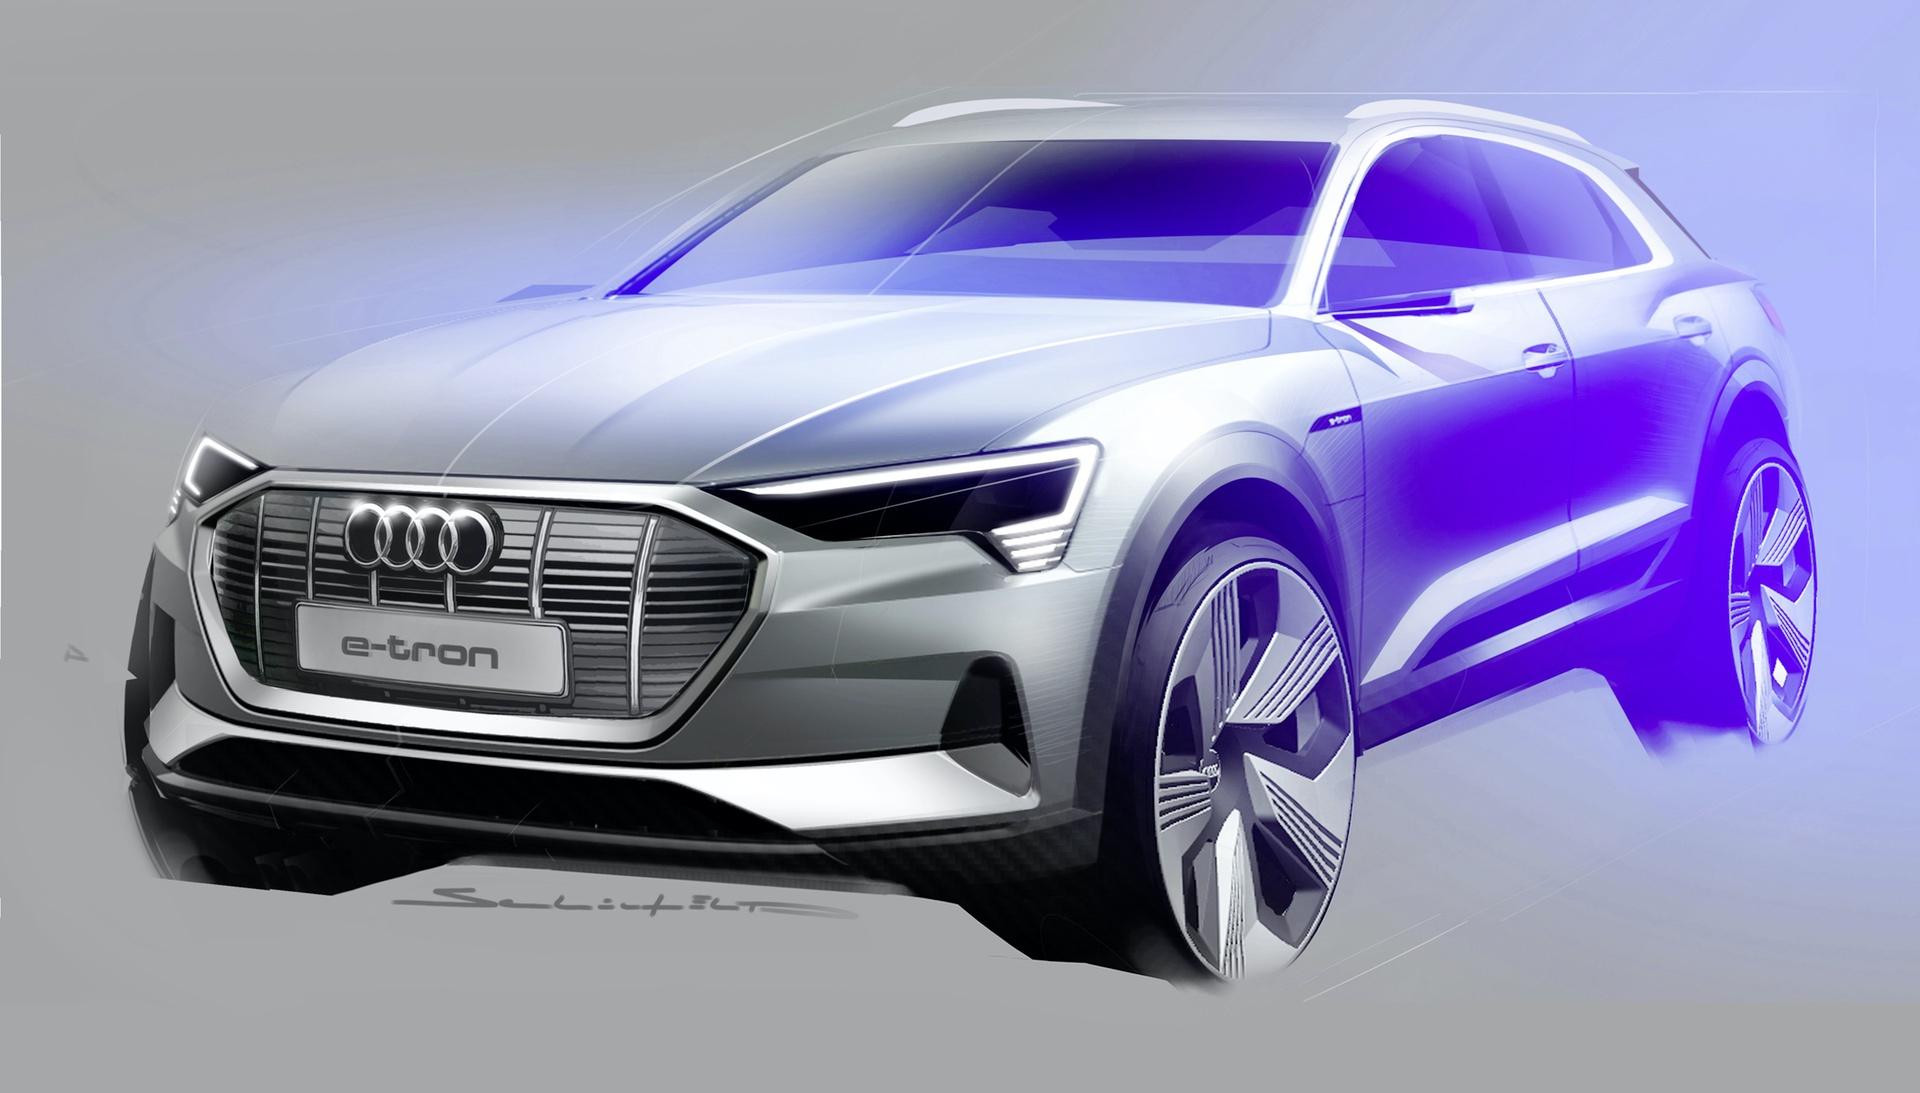 2019_Audi_E-Tron_0029